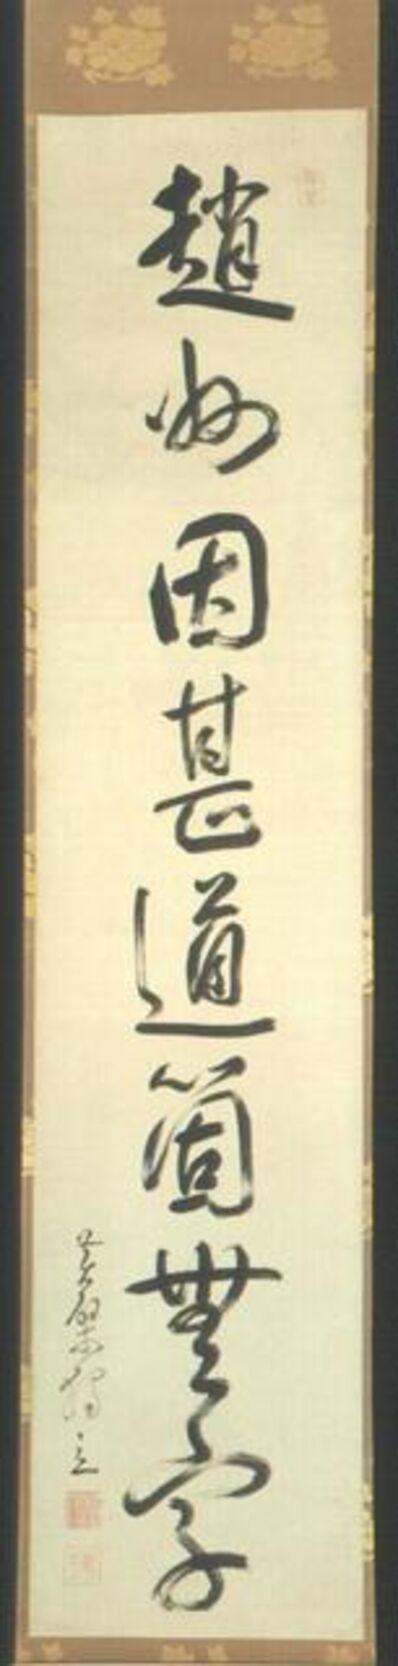 Obaku Dokuryu, 'Calligraphy', 1596-1672